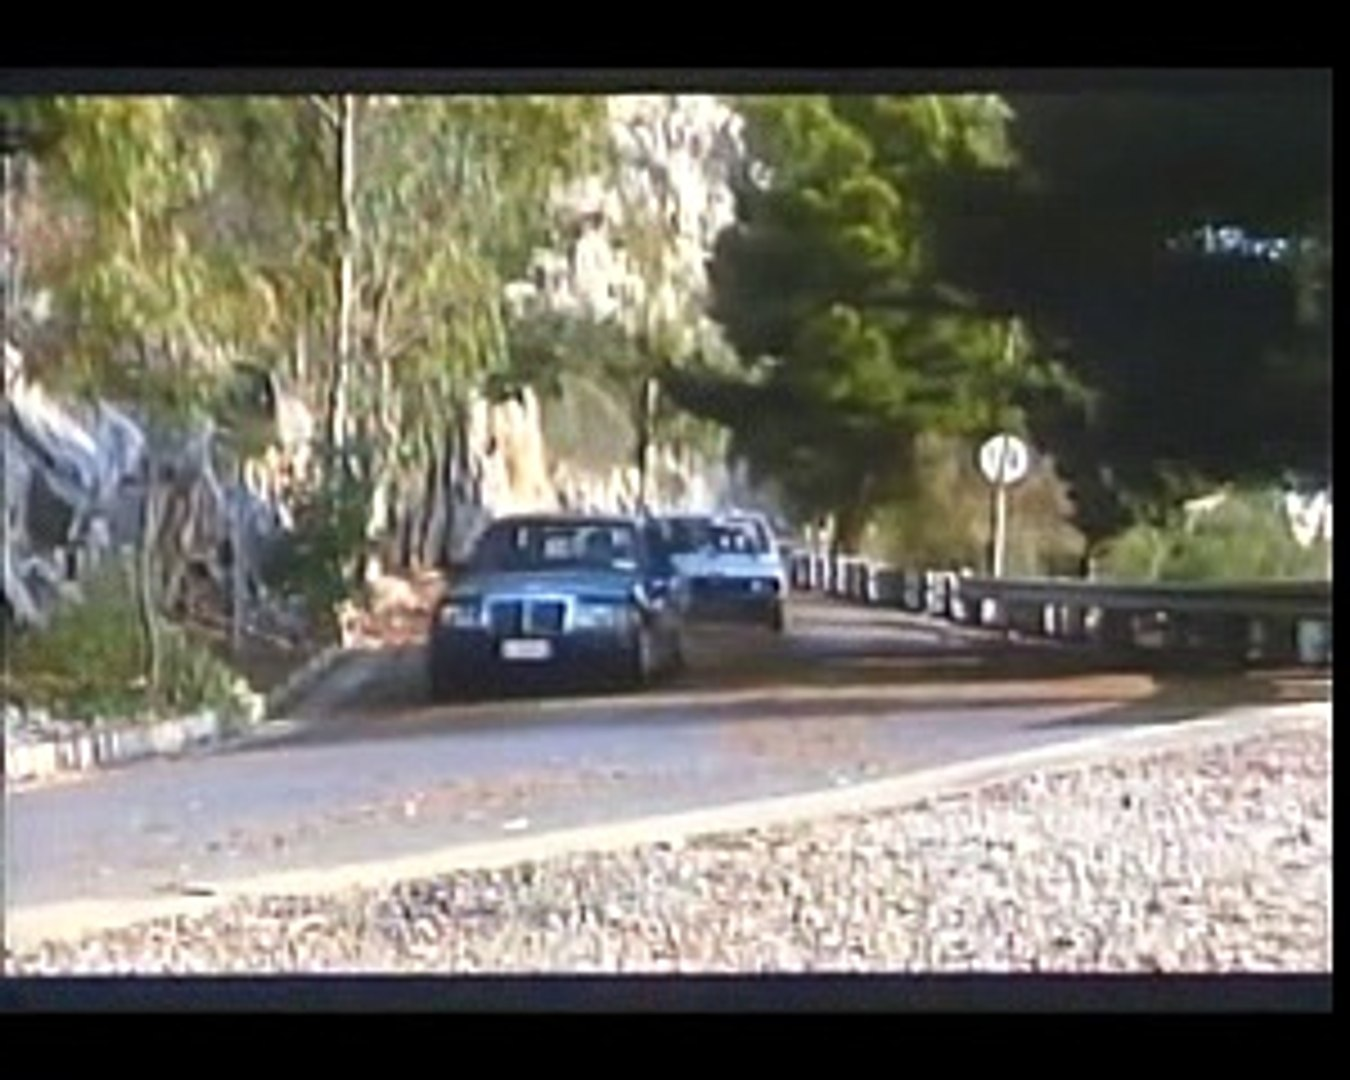 VITE PERDUTE [1992] - FILM COMPLETO - [1 Parte]